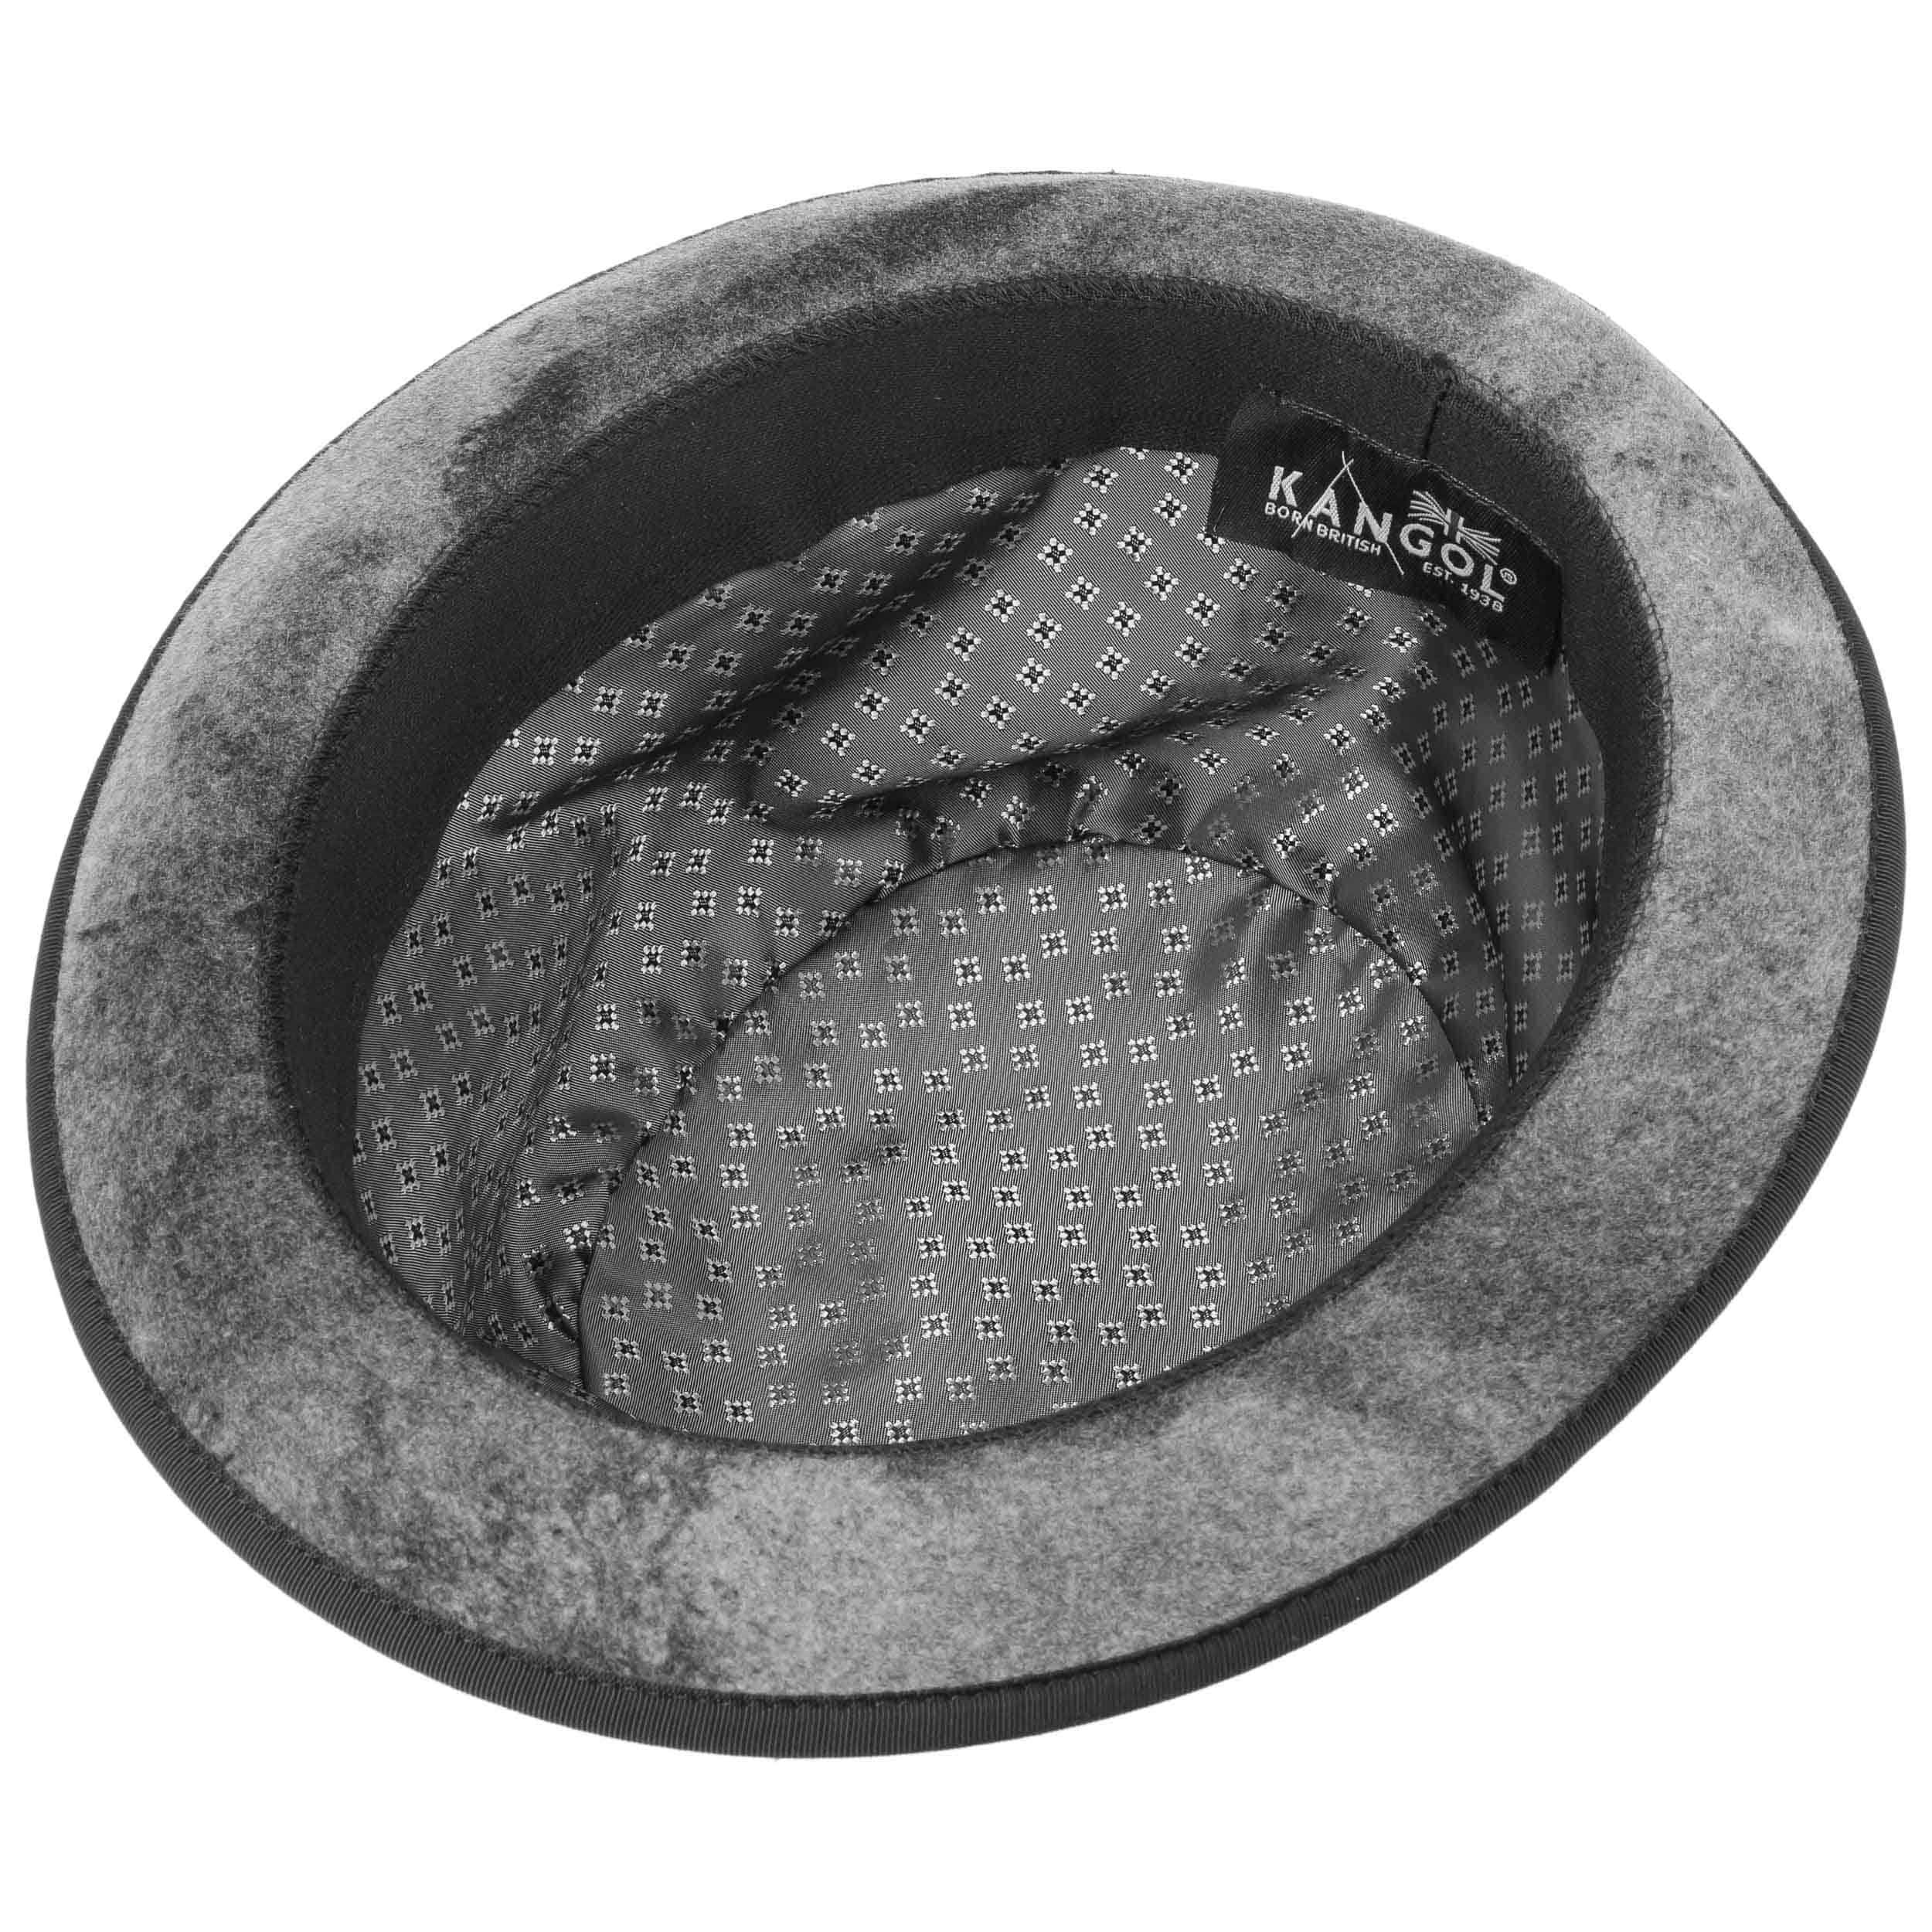 ... Aged Bowler Wool Felt Hat by Kangol - grey 3 ... 6c330834d341